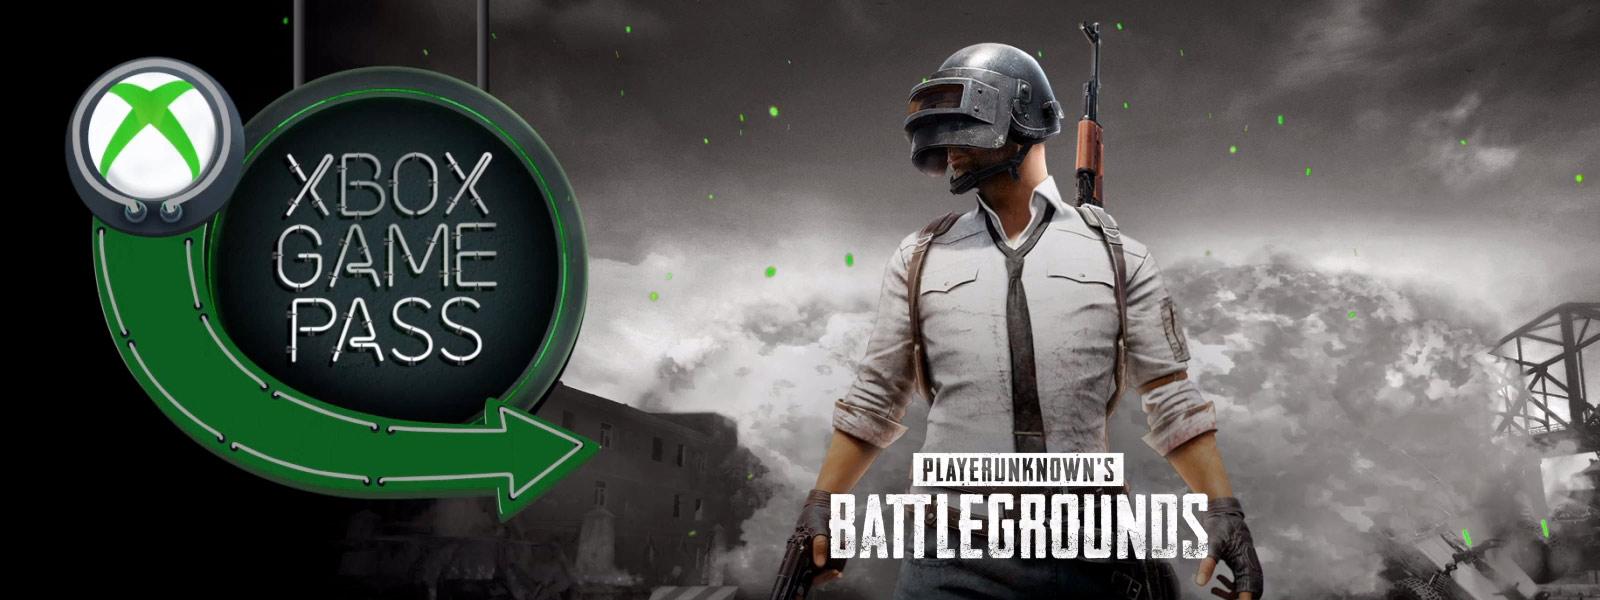 Playerunknowns Battlegrounds For Xbox One Kaset Bd Game Ps4 Battle World Kronos Reg 2